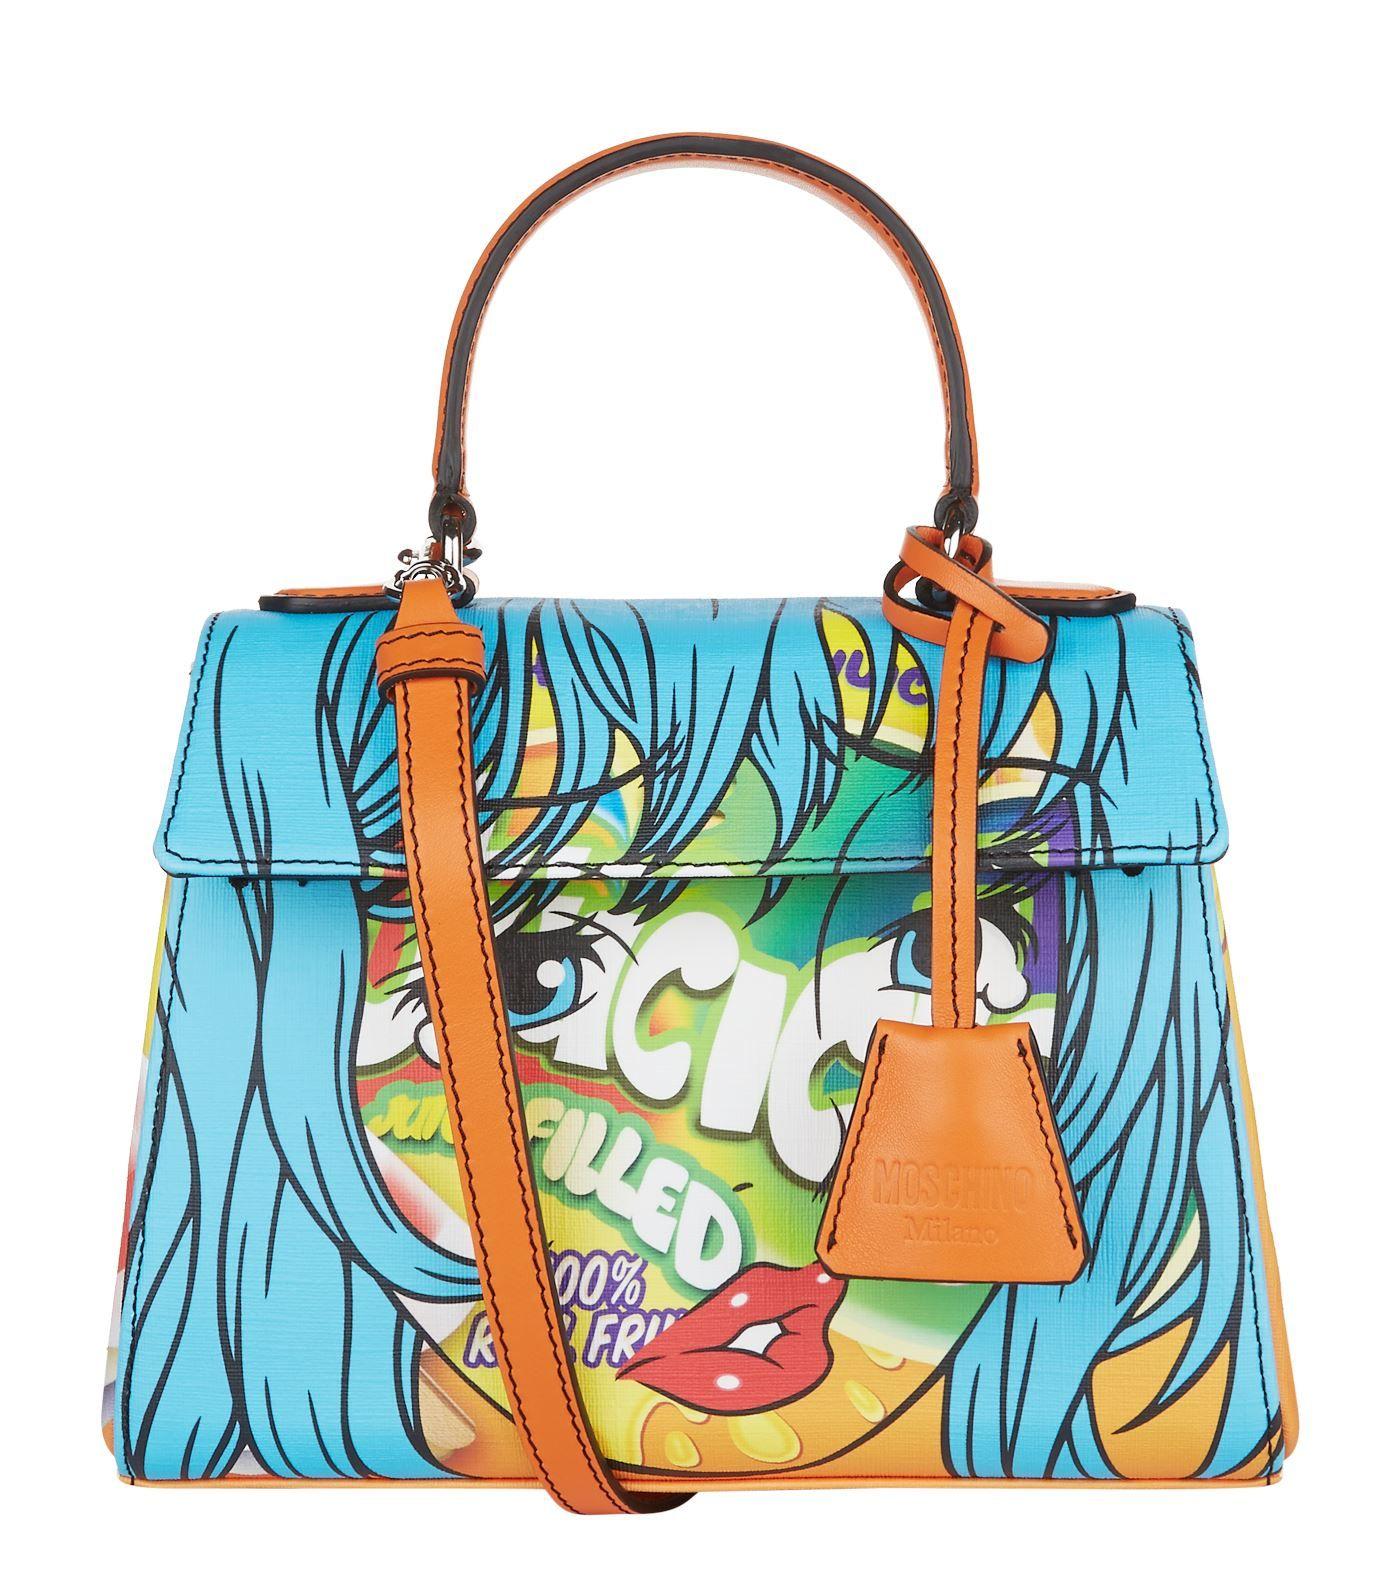 57e5029121 Moschino Leather Fantasy Print Shoulder Bag at Harrods. Shop online at  harrods.com   earn reward points.